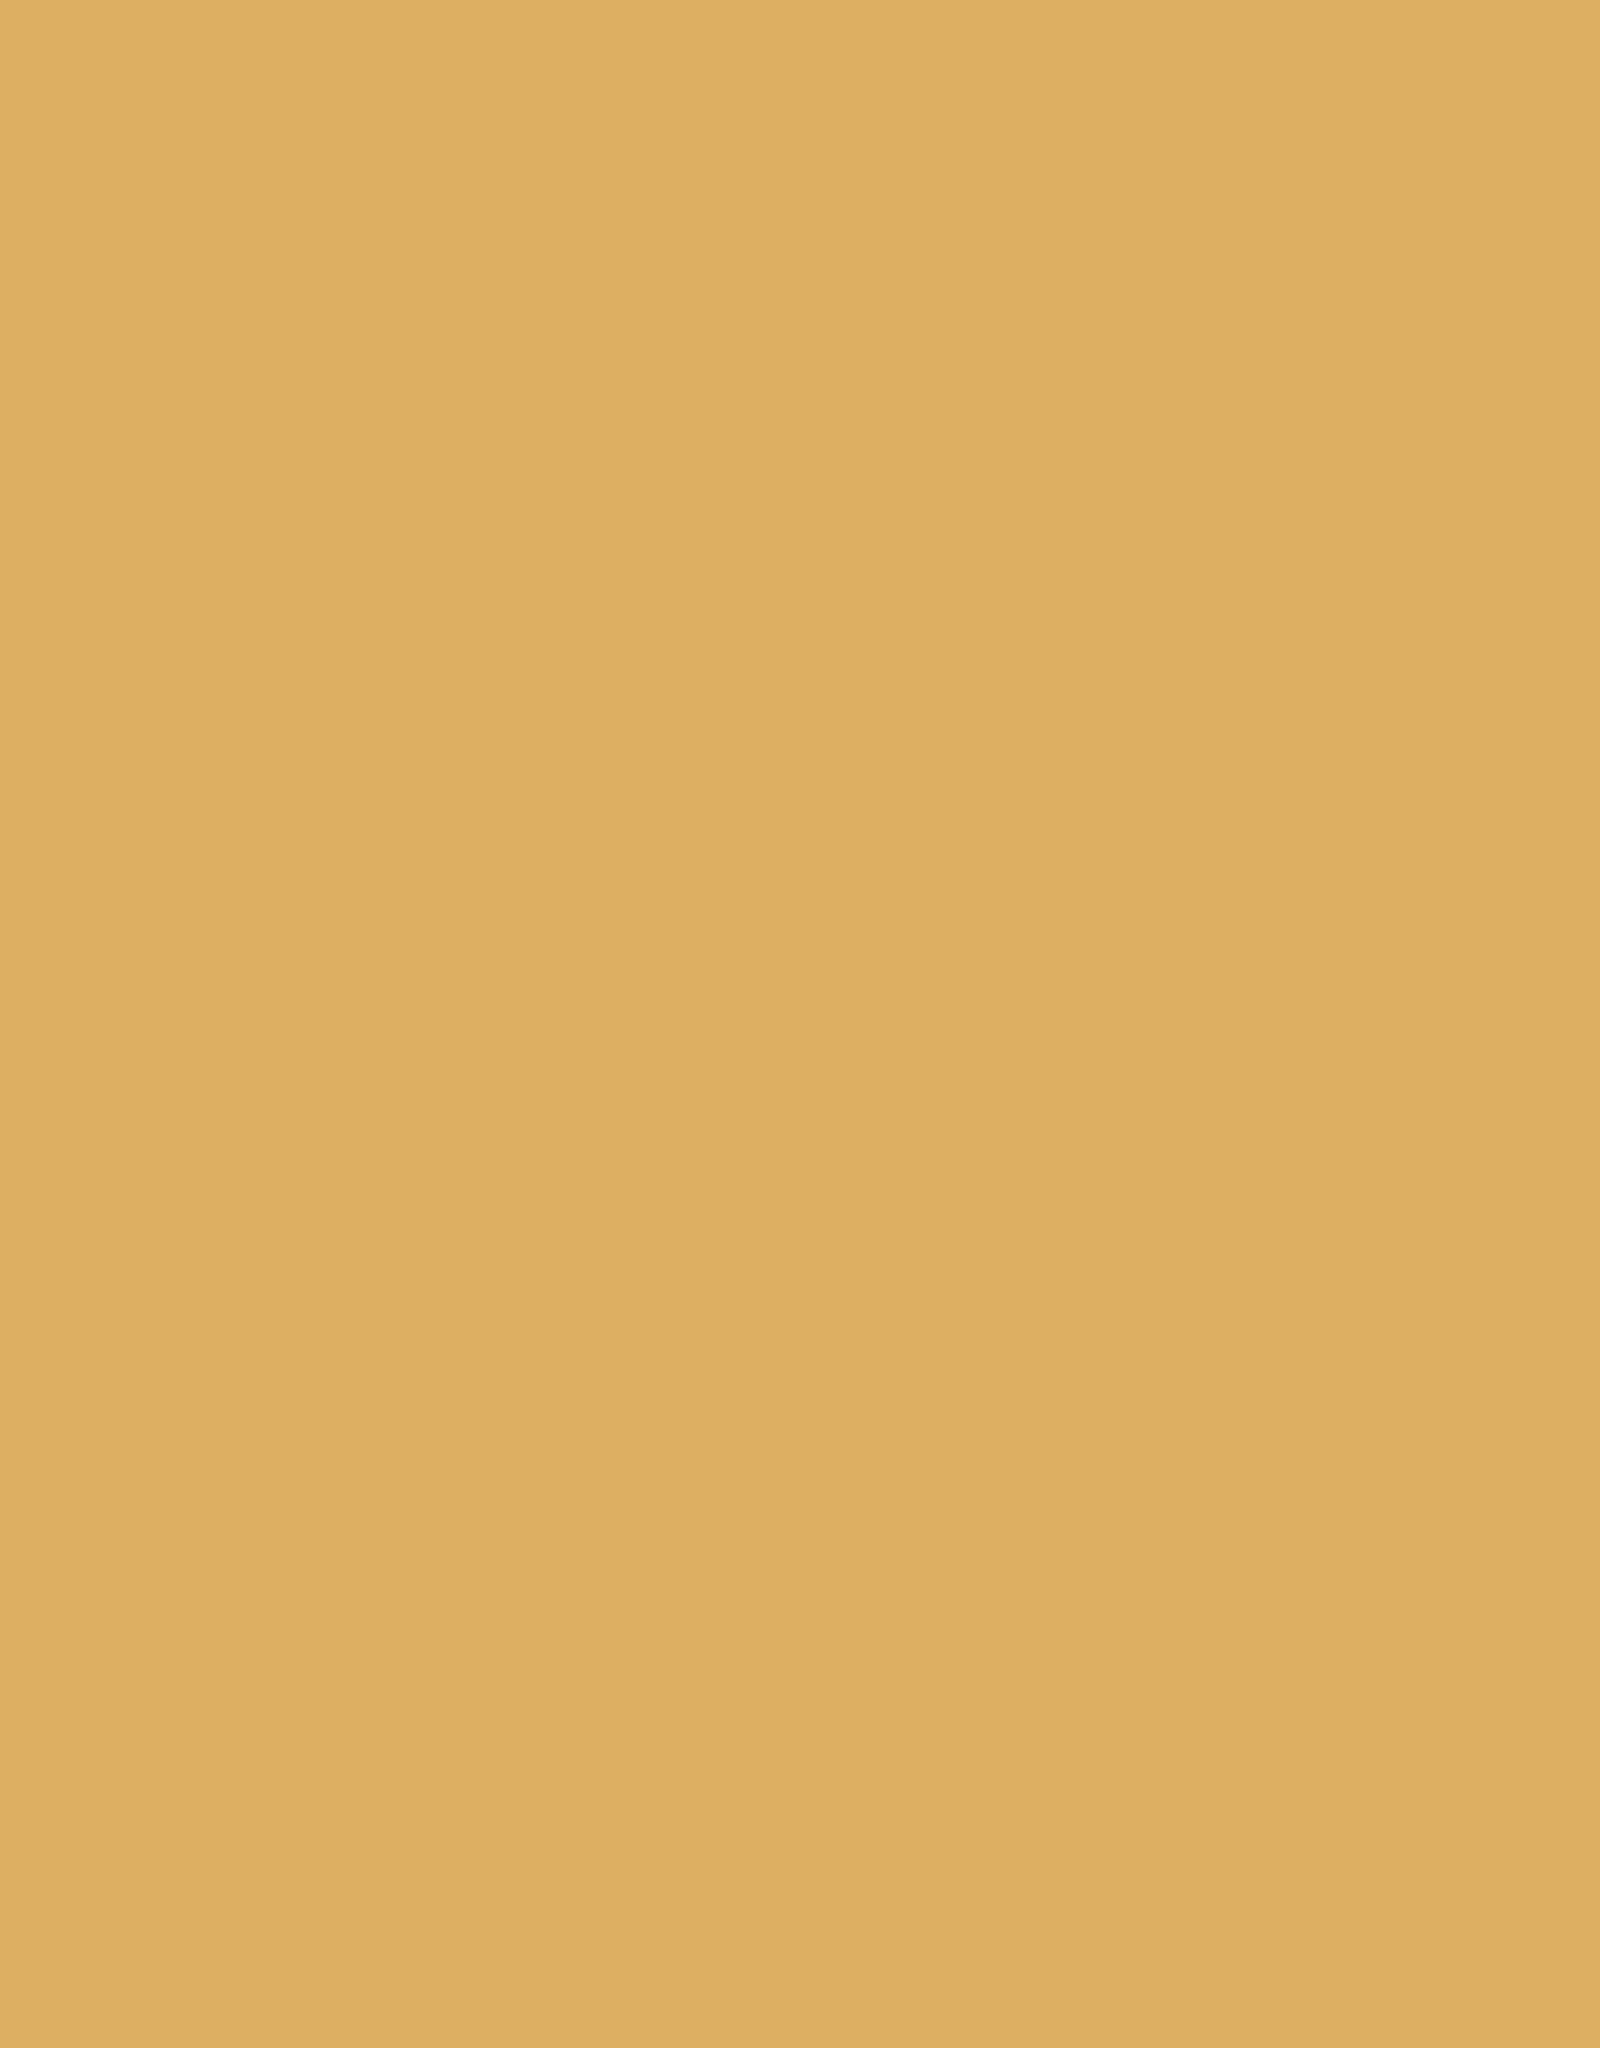 Sennelier, Extra Fine Soft Pastel, Amber, N 953